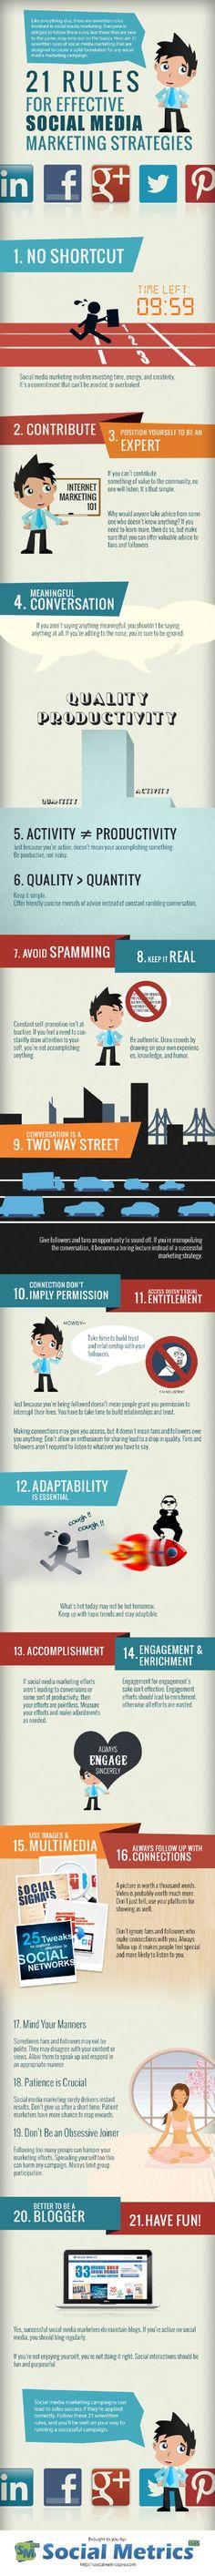 21 Social Media Marketing Tips (Infographic)